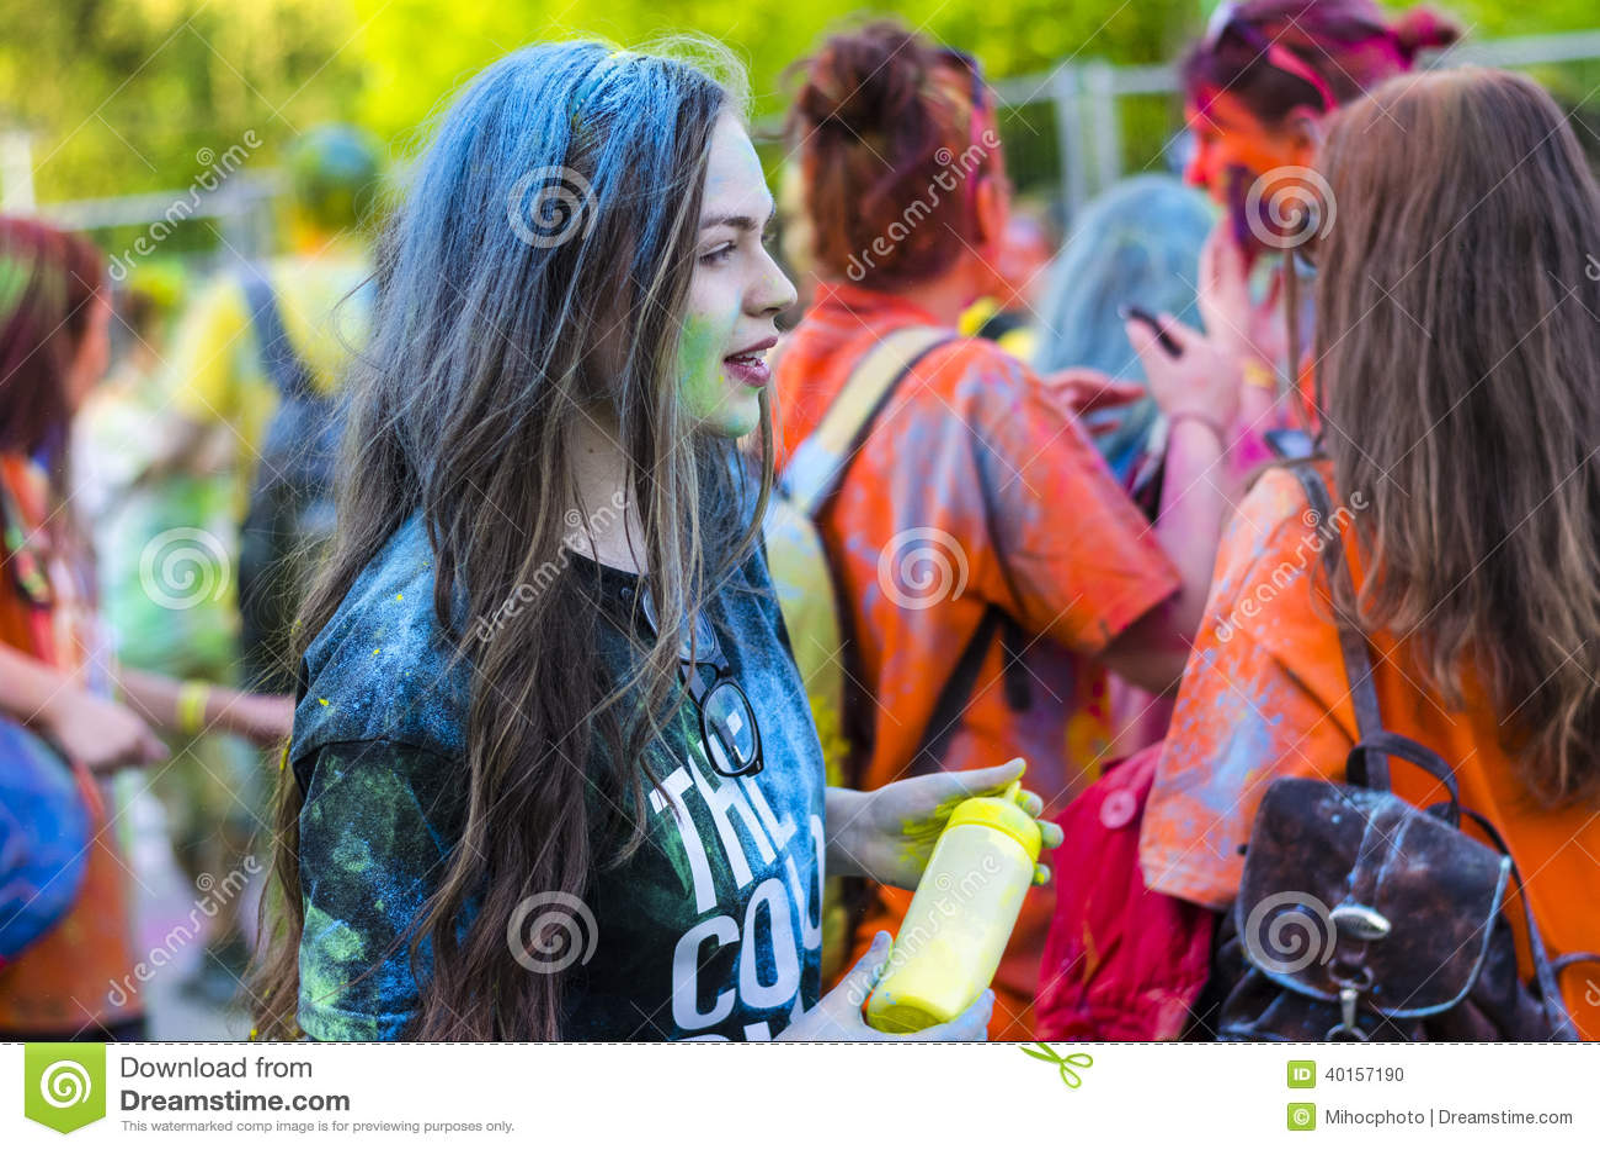 A menina drapejou no pó azul na corrida da cor